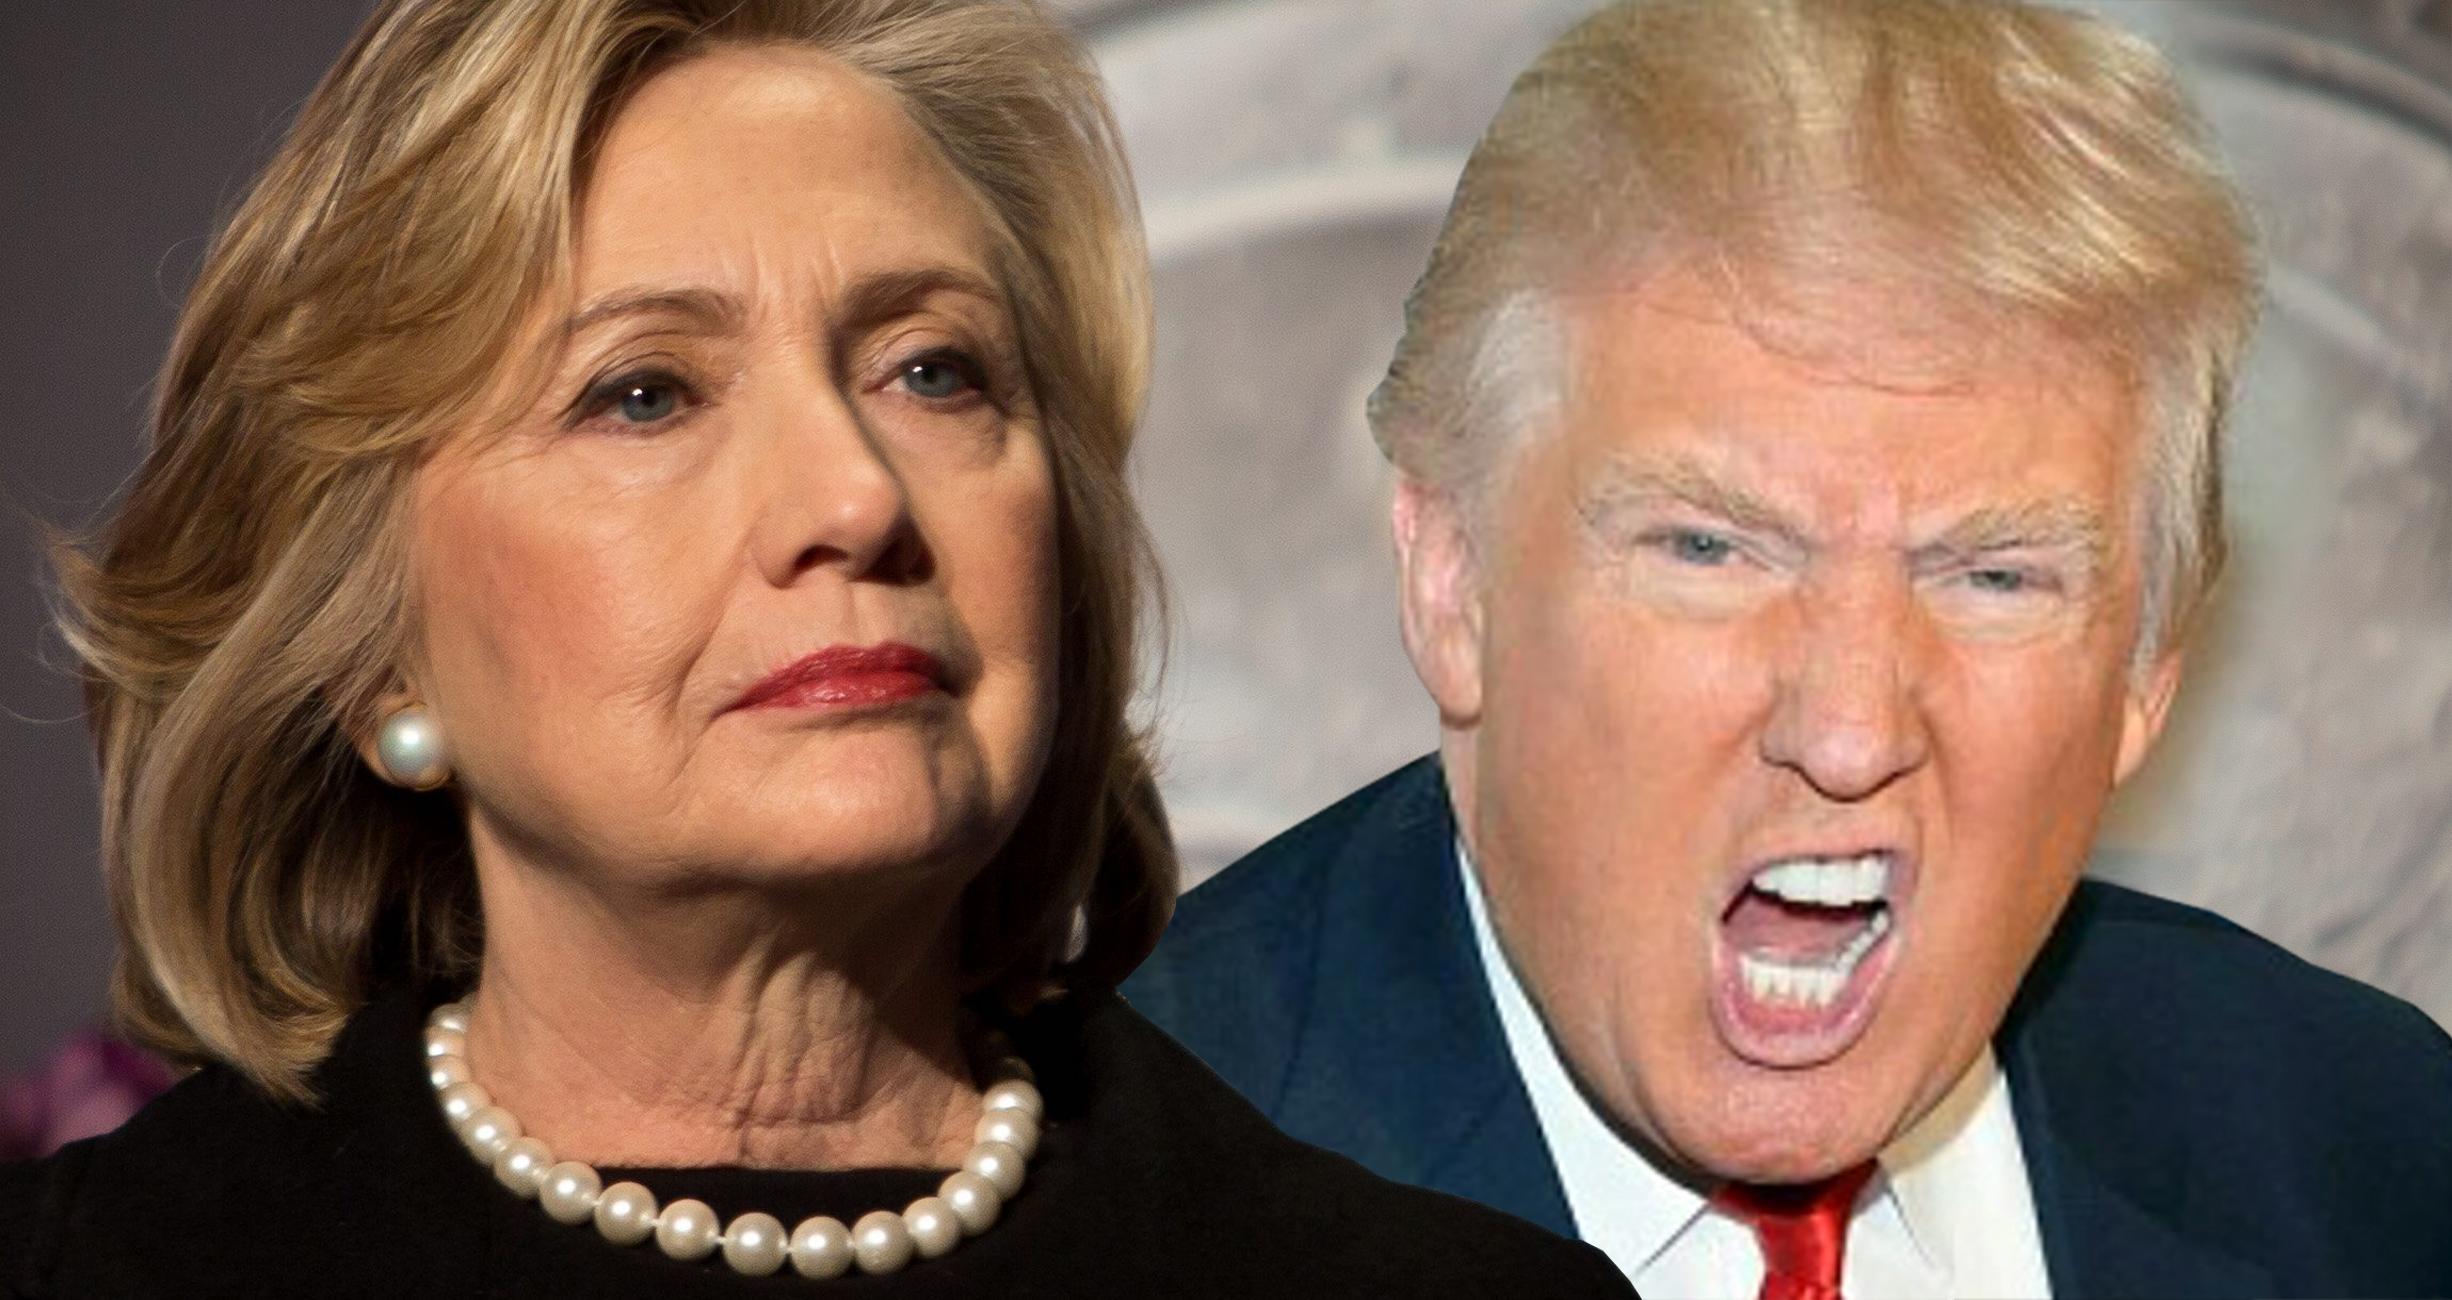 Donald Trump Launches Vulgar Attack On Hillary Clinton – Video